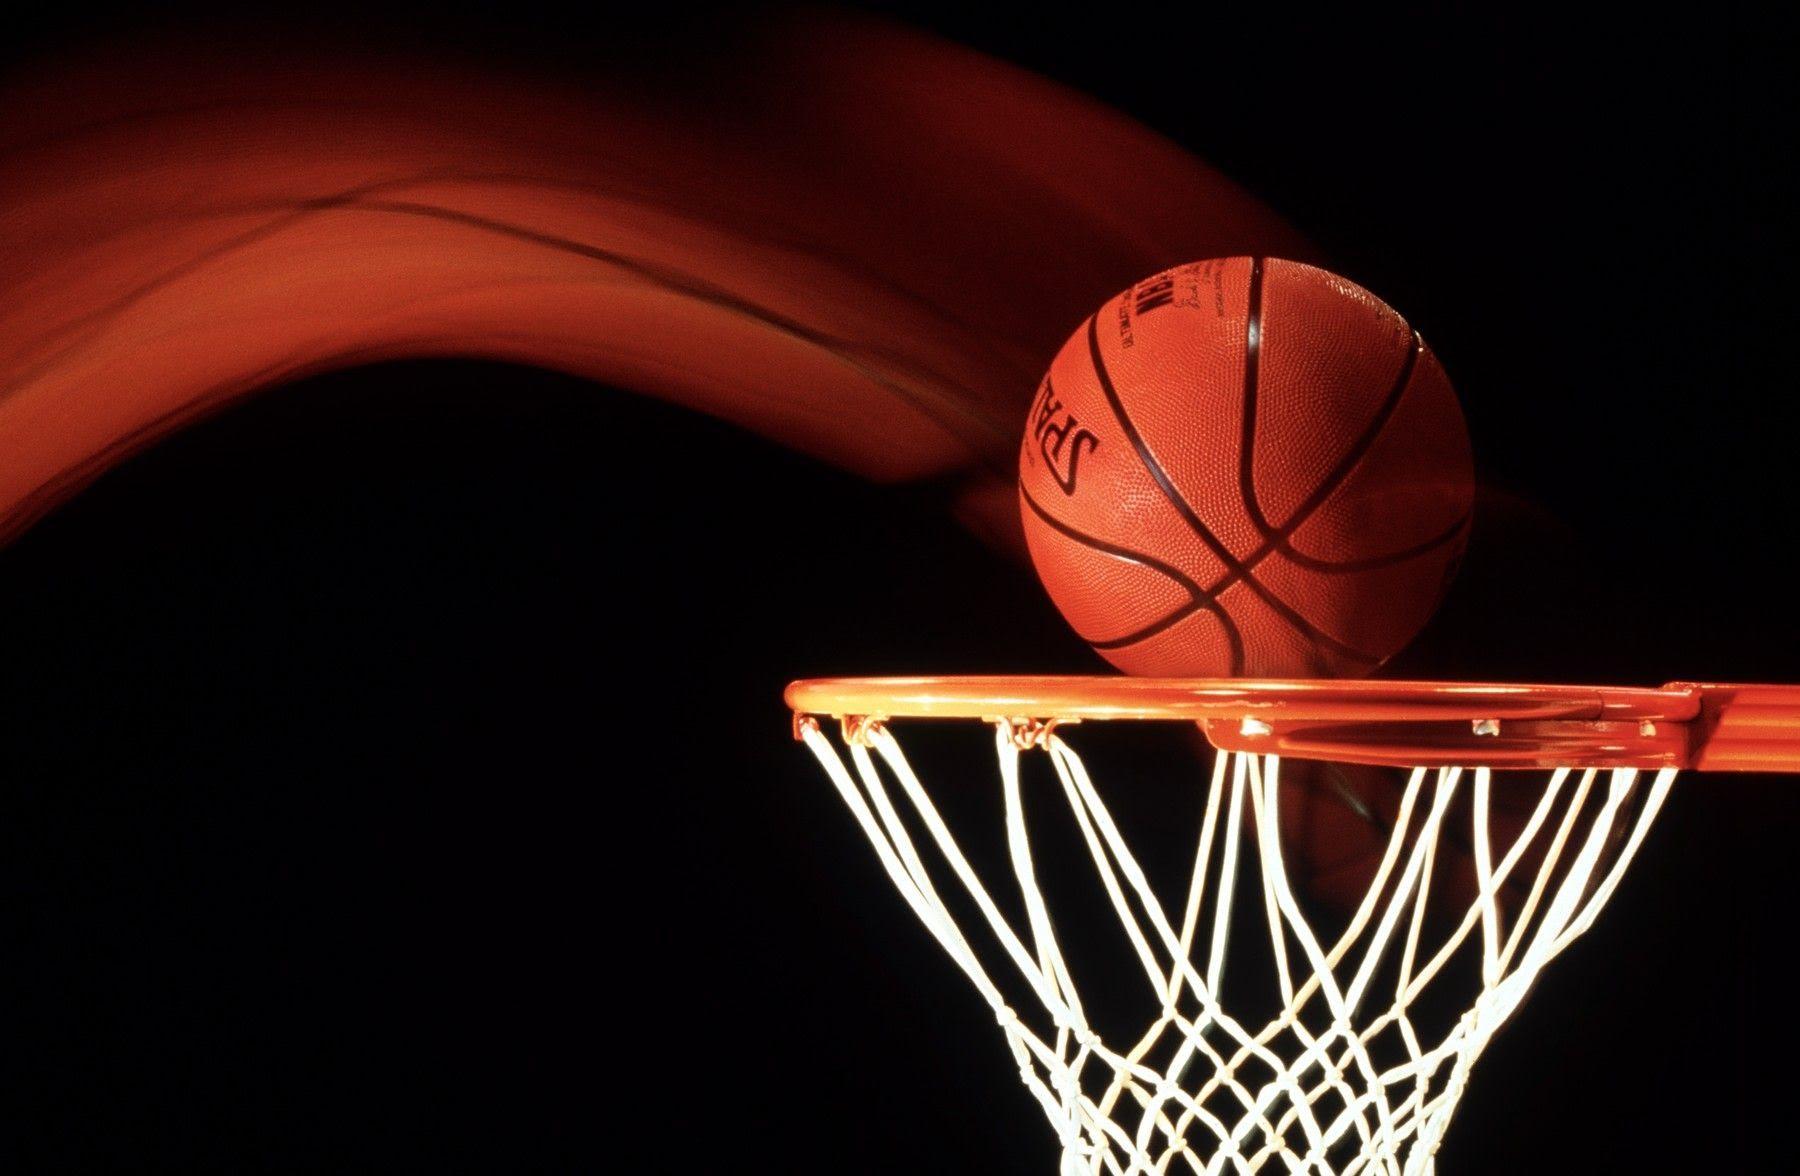 Bosnian visas, at long last, for the Kosovo basketball players